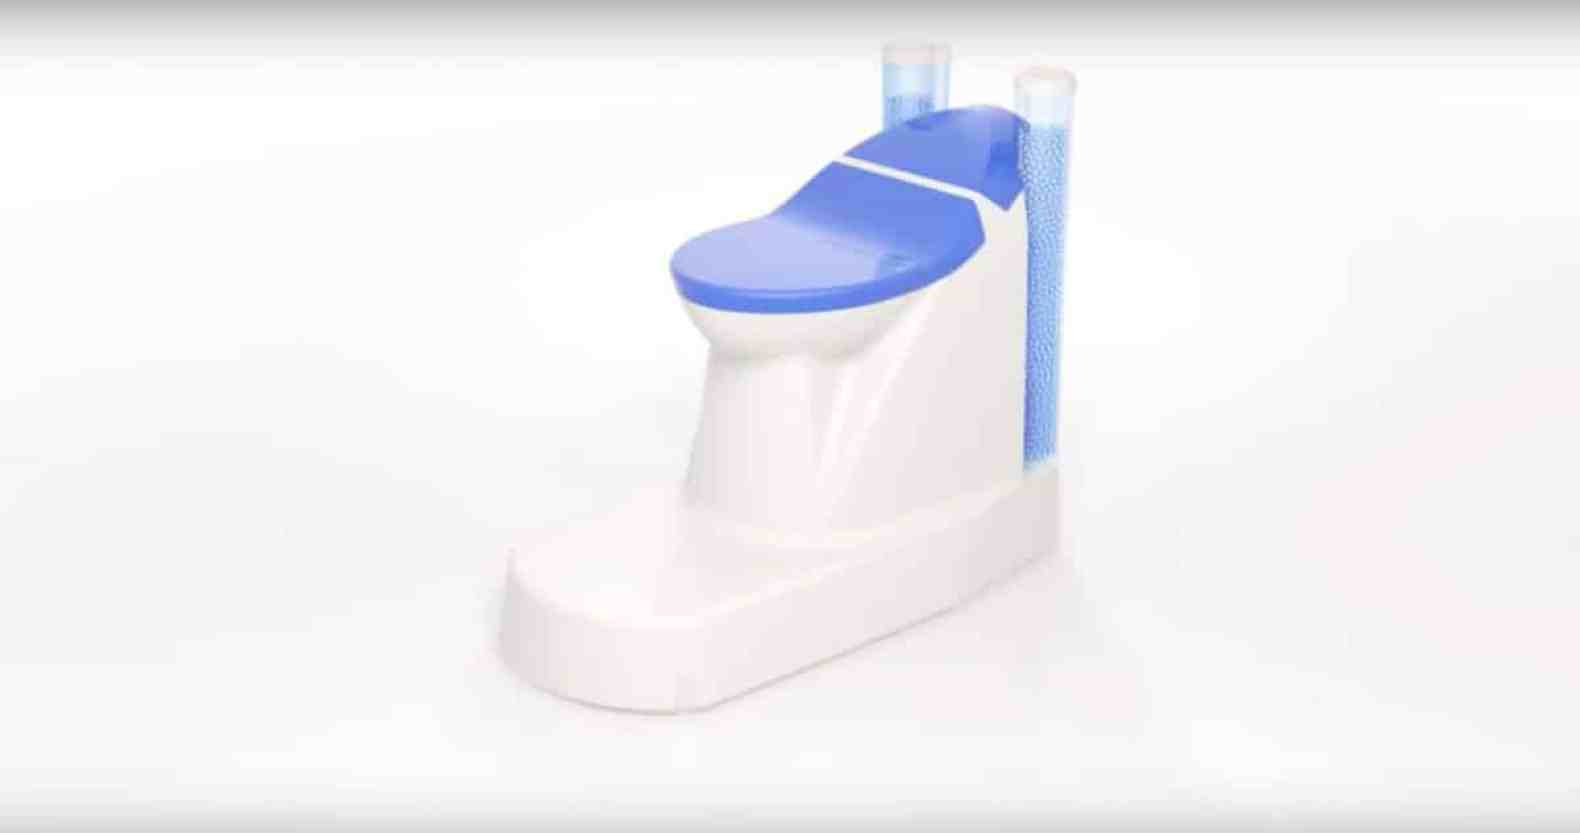 Cranfield Nano Membrane Toilet. El inodoro sin agua